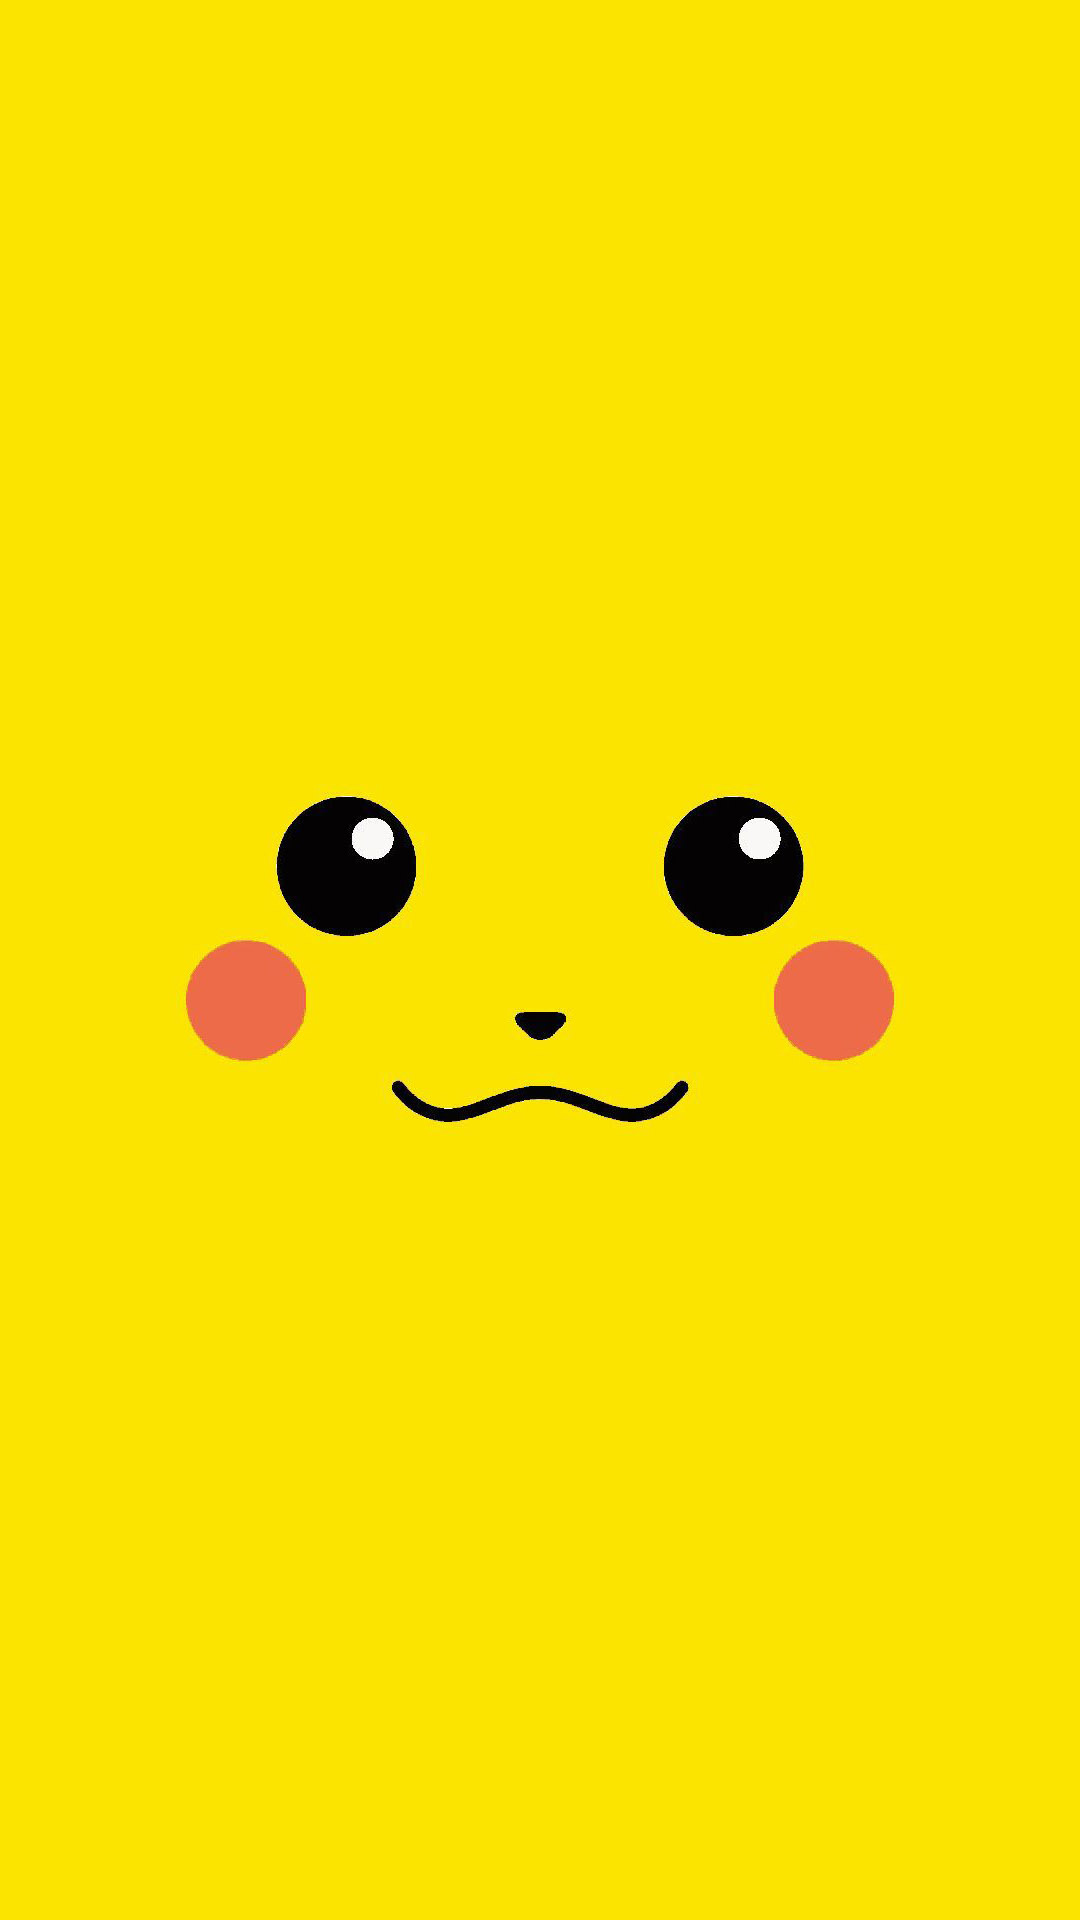 Cute Pokemon Iphone 6 Wallpaper Pikachu Pokemon Iphone Wallpaper Iphone Wallpaper